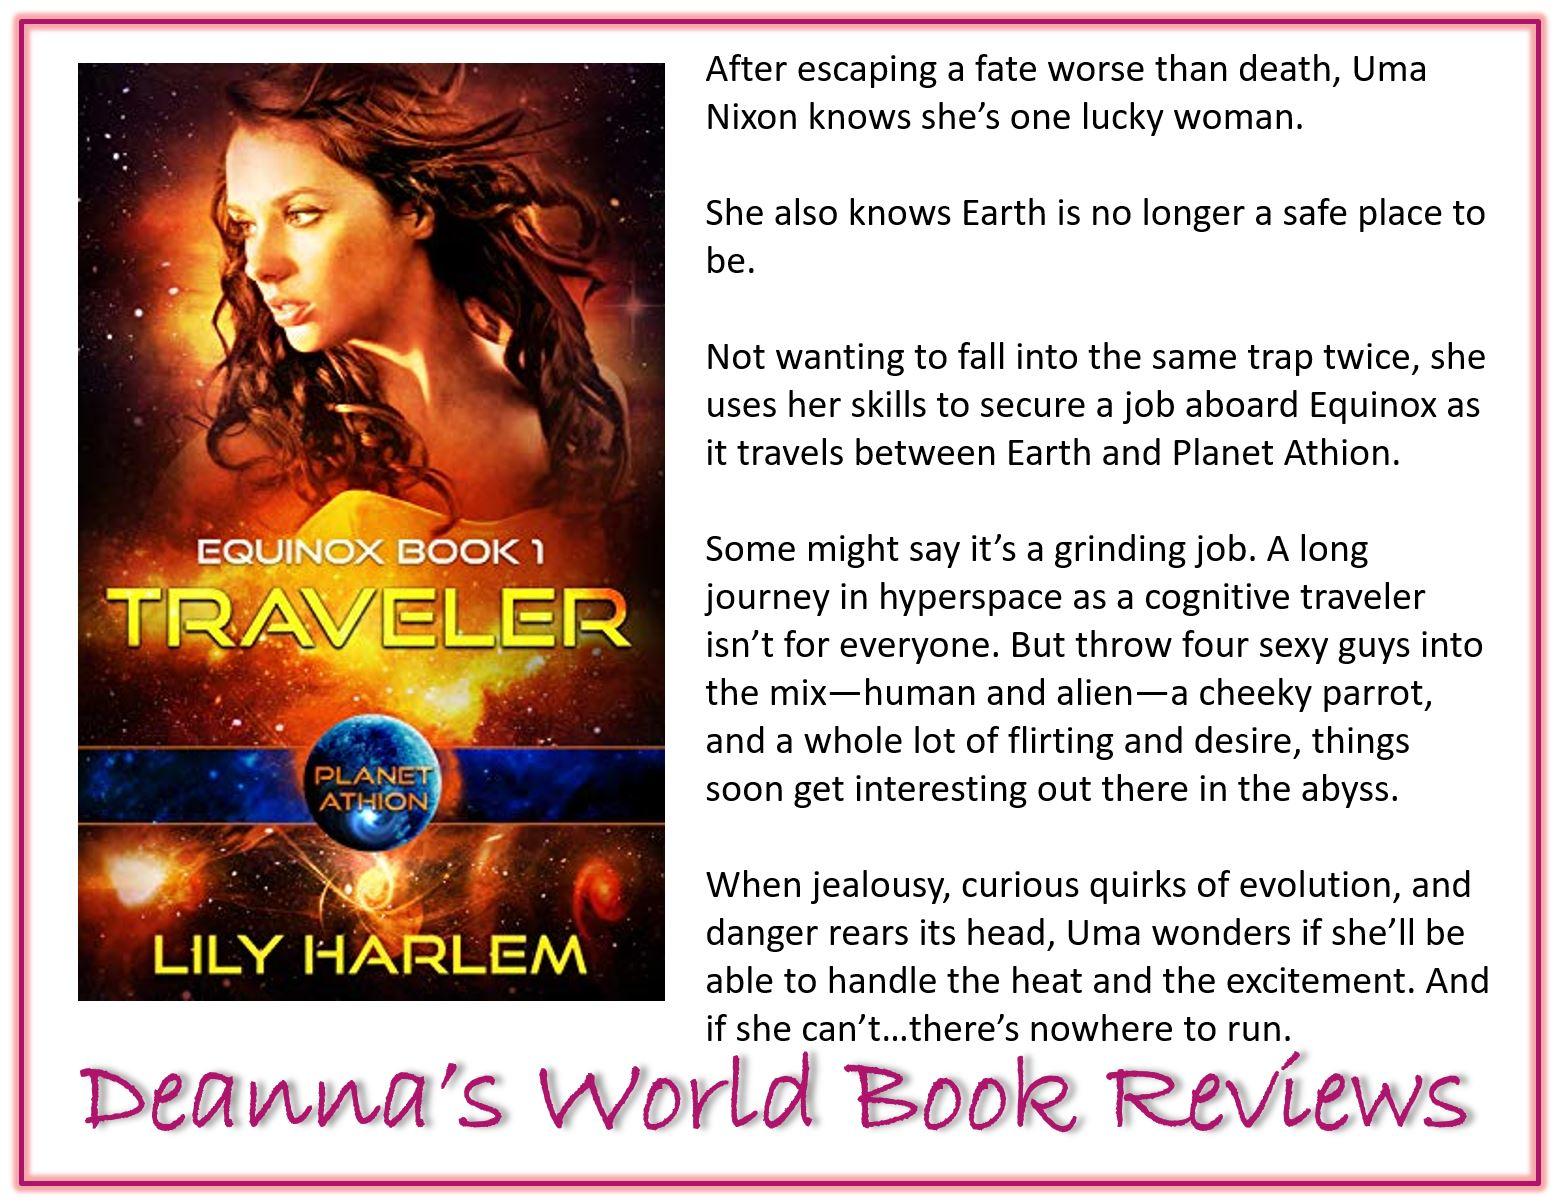 Traveler by Lily Harlem blurb